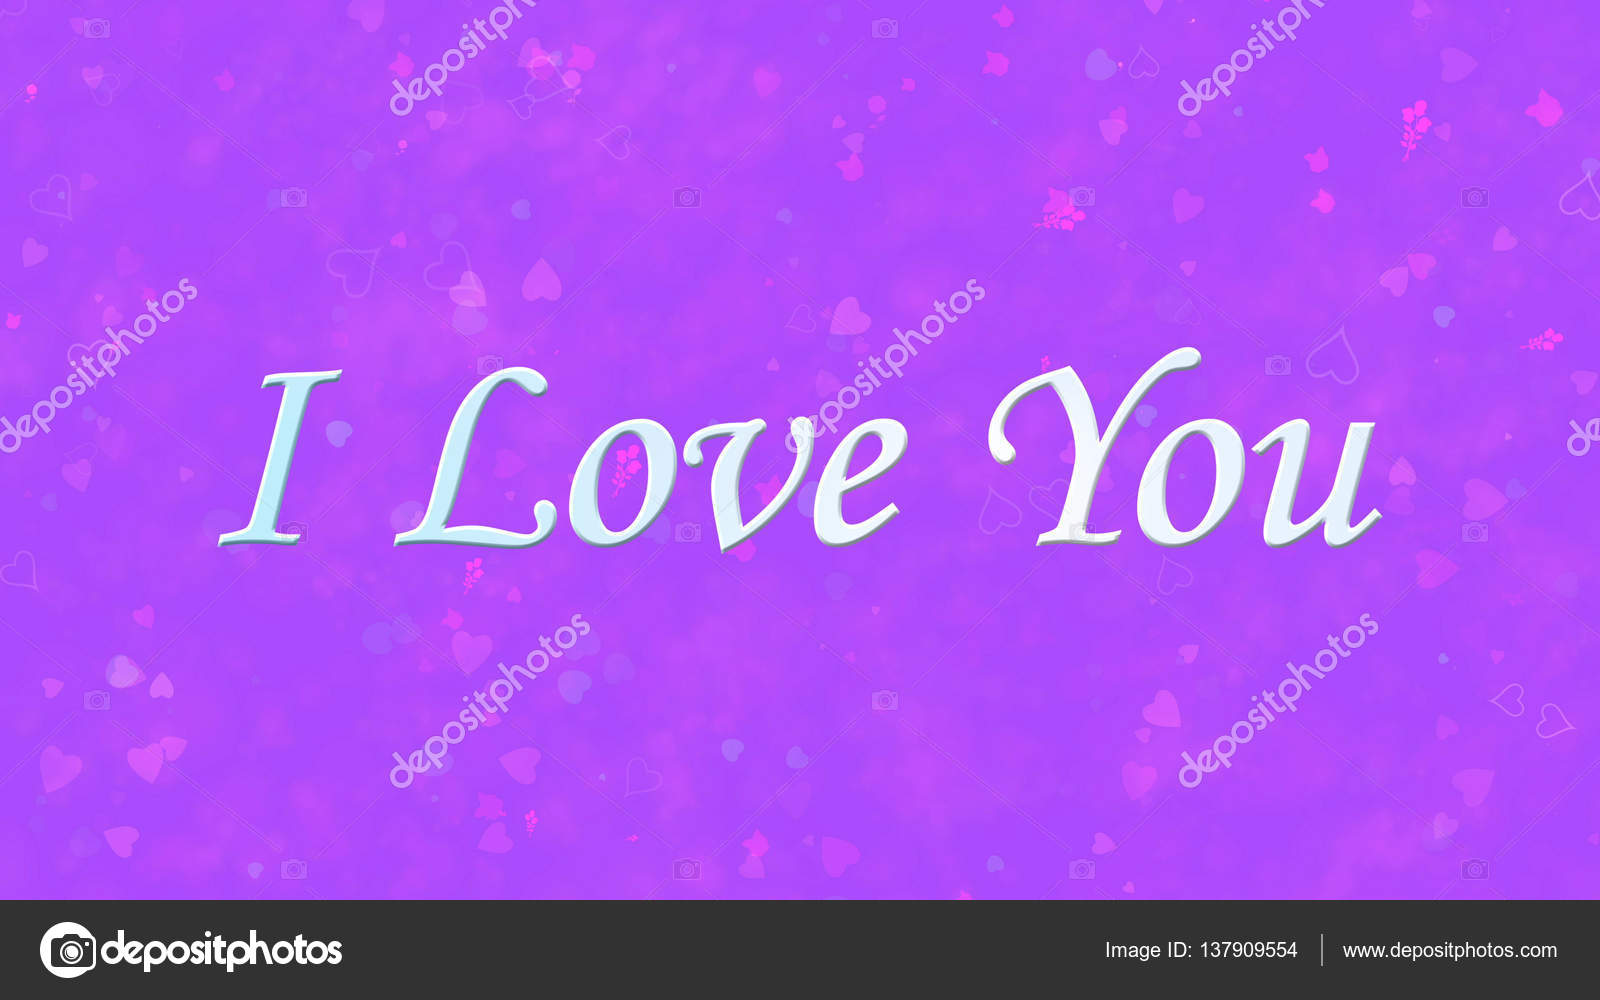 i love you text on purple background ストック写真 diplikaya